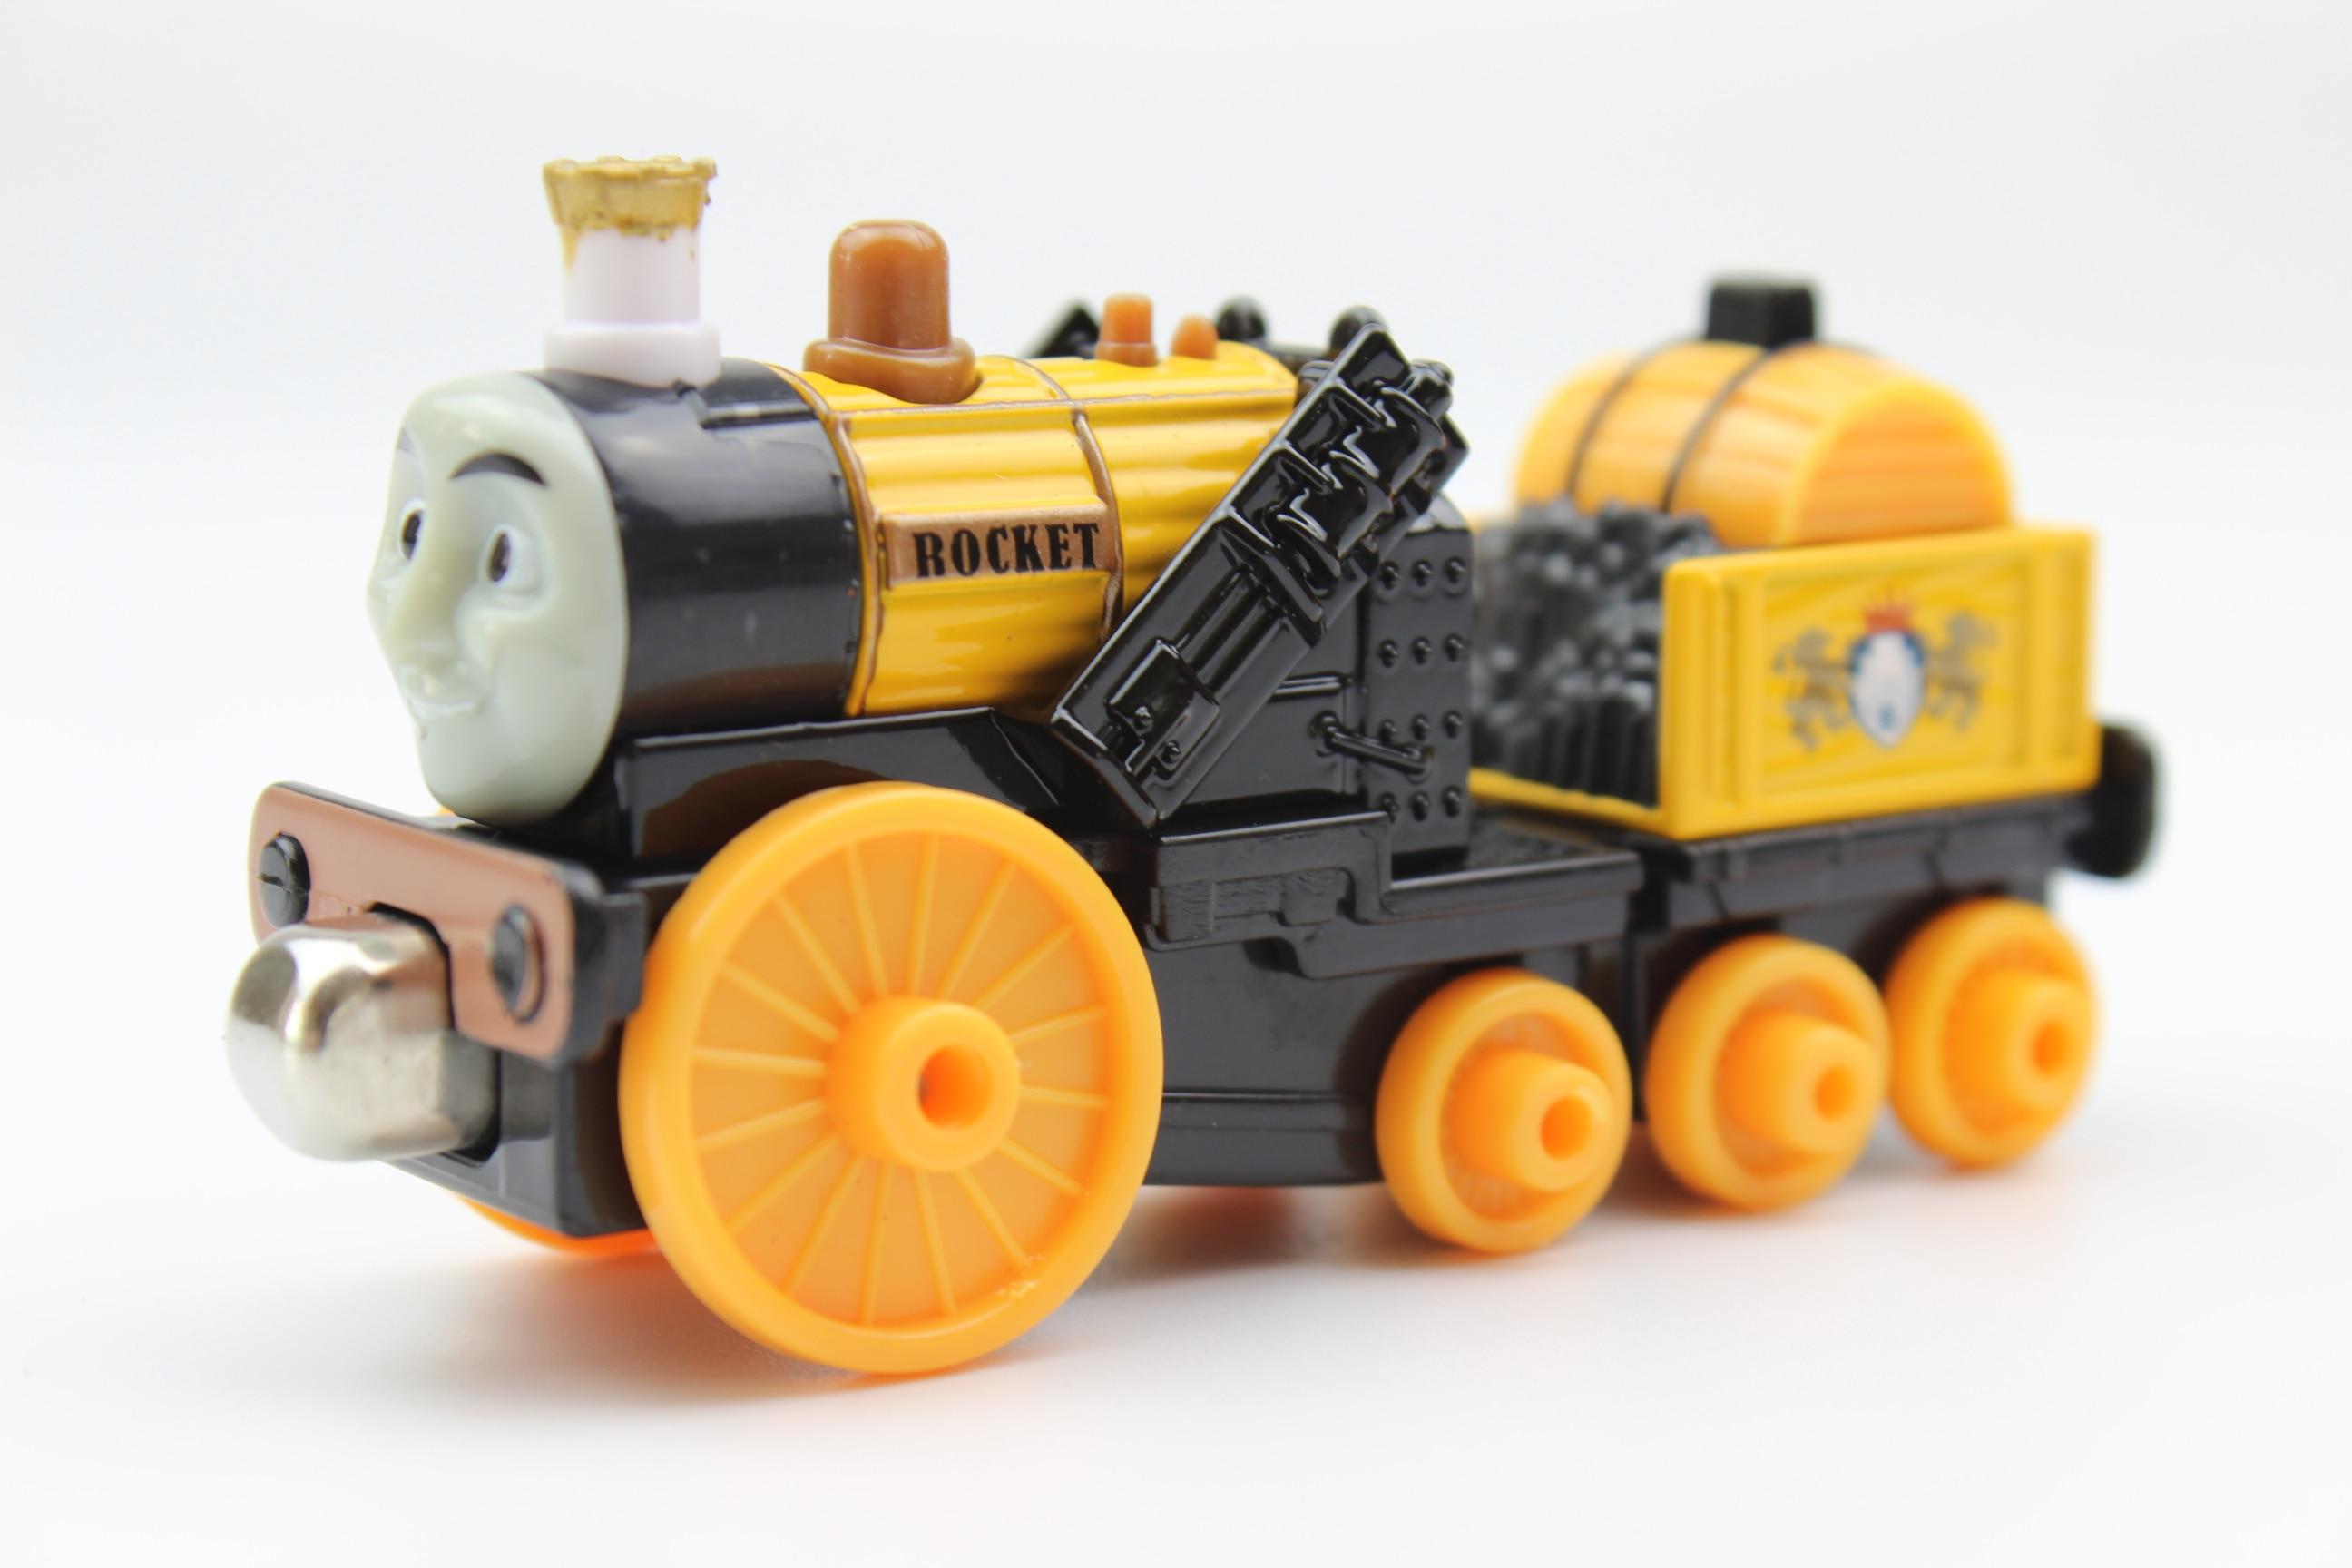 Diecast Toy Vehicles Train ROCKET Fit For BRIO Toy Car T110D Truck Locomotive Engine Railway Toys For Children